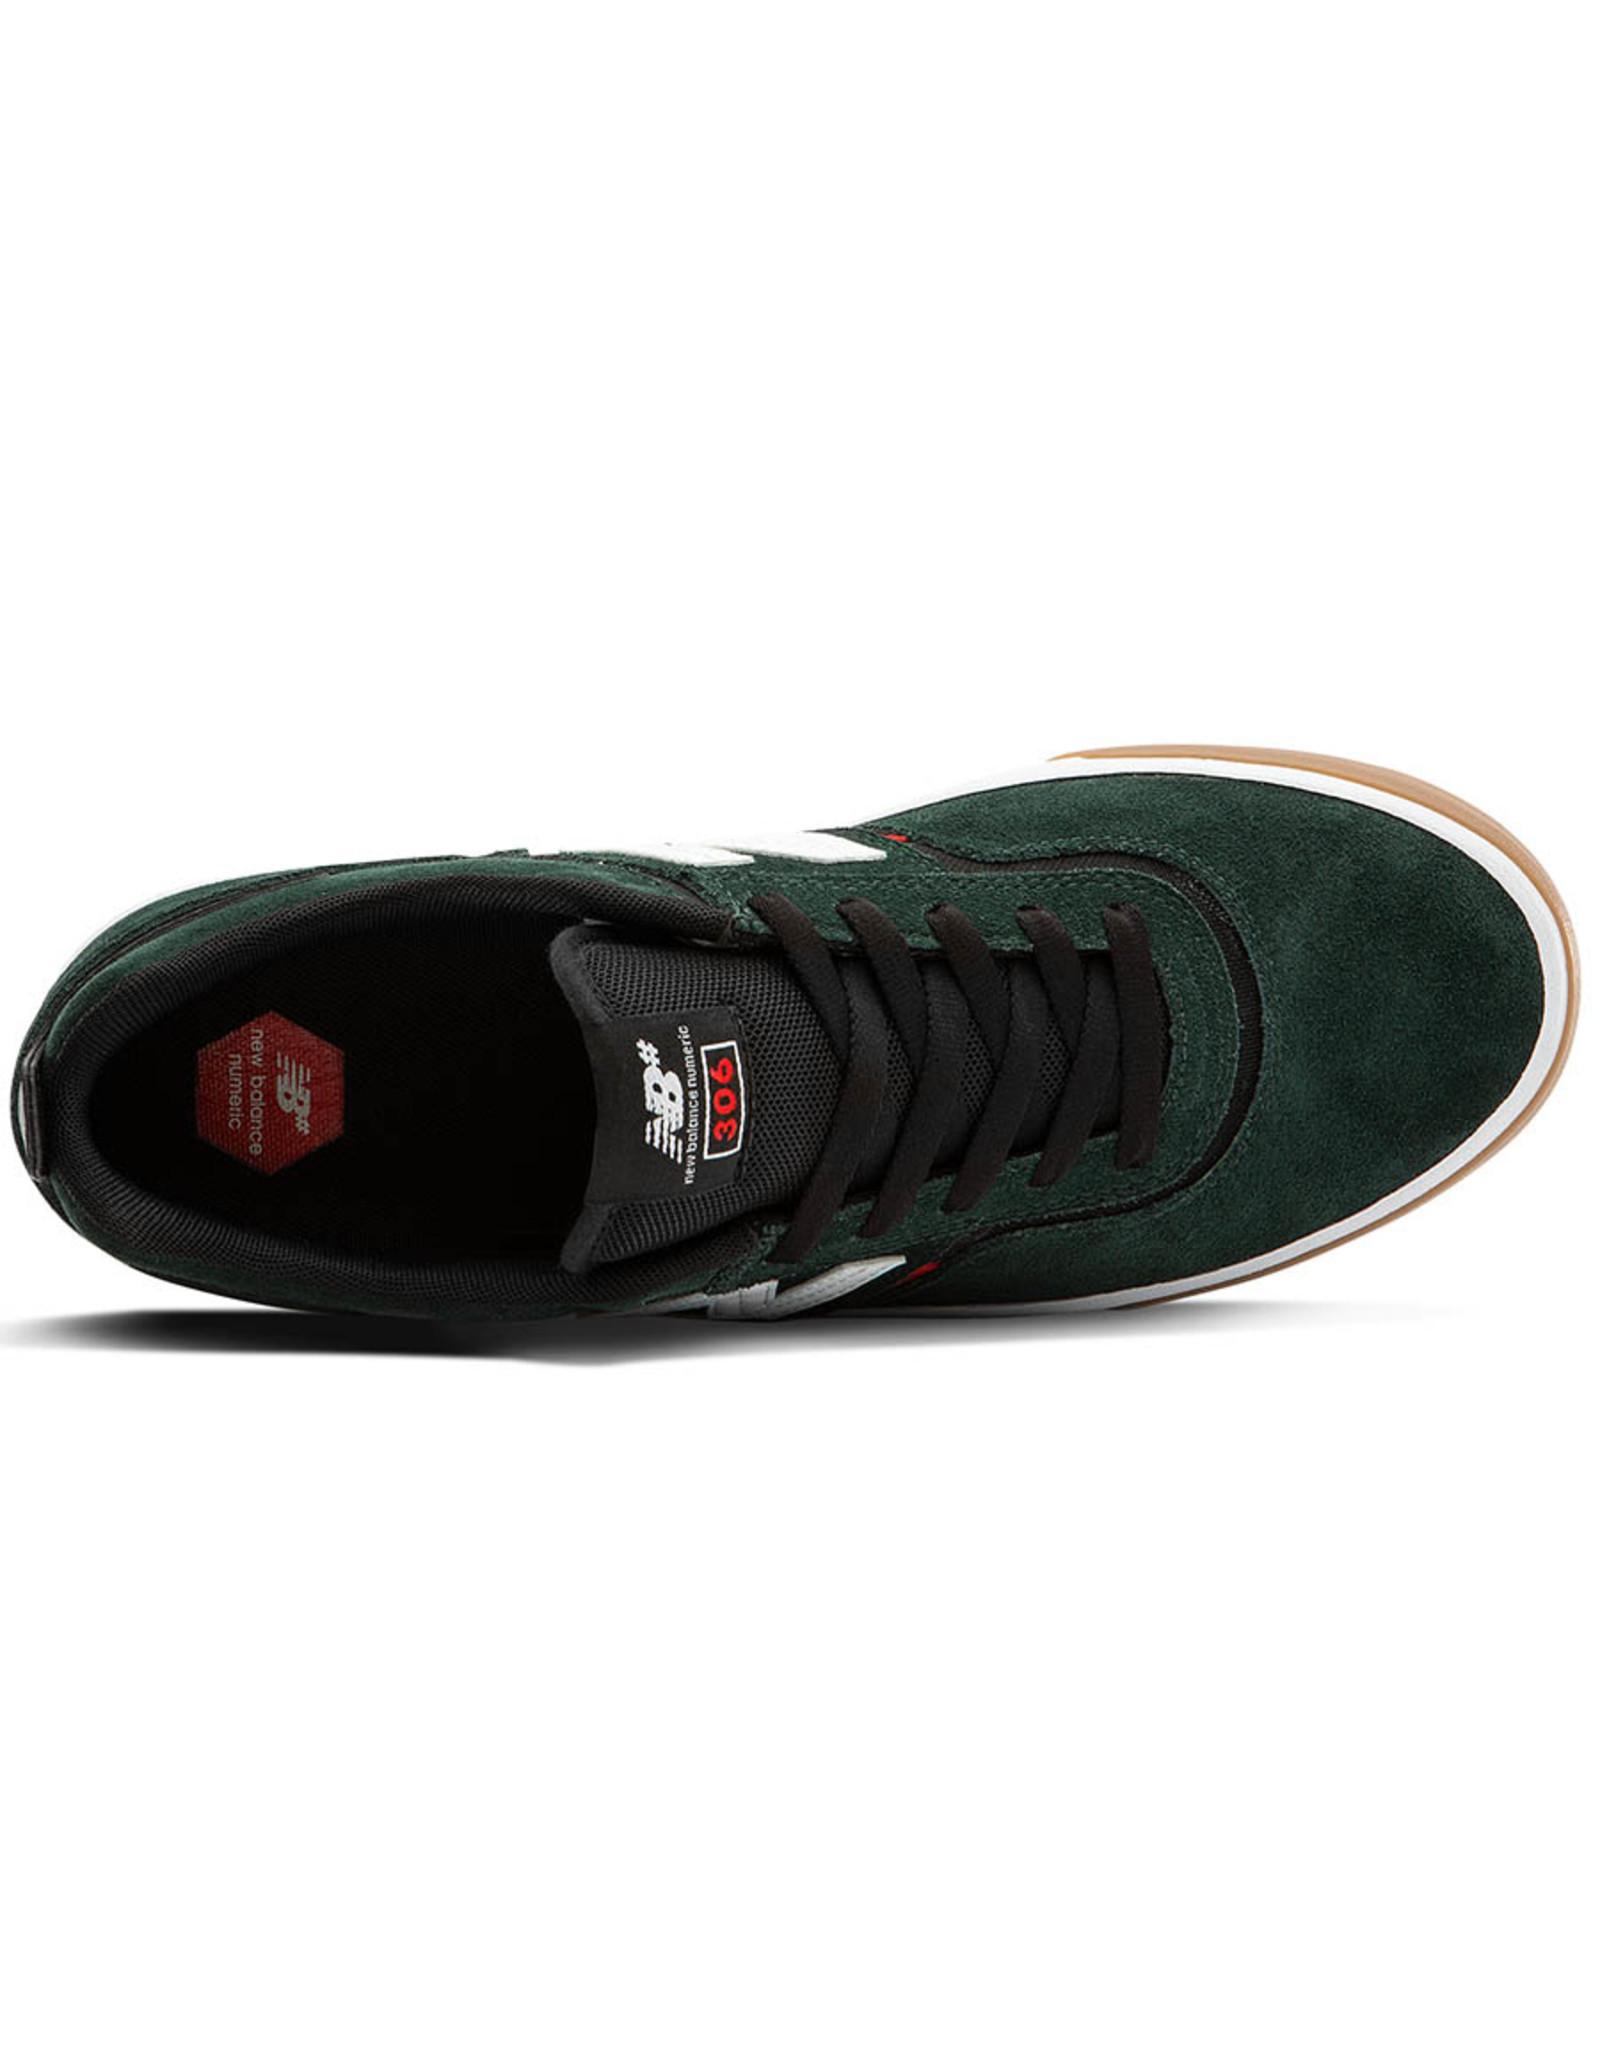 New Balance Numeric New Balance Numeric Shoe 306 Jamie Foy (Green/Red)